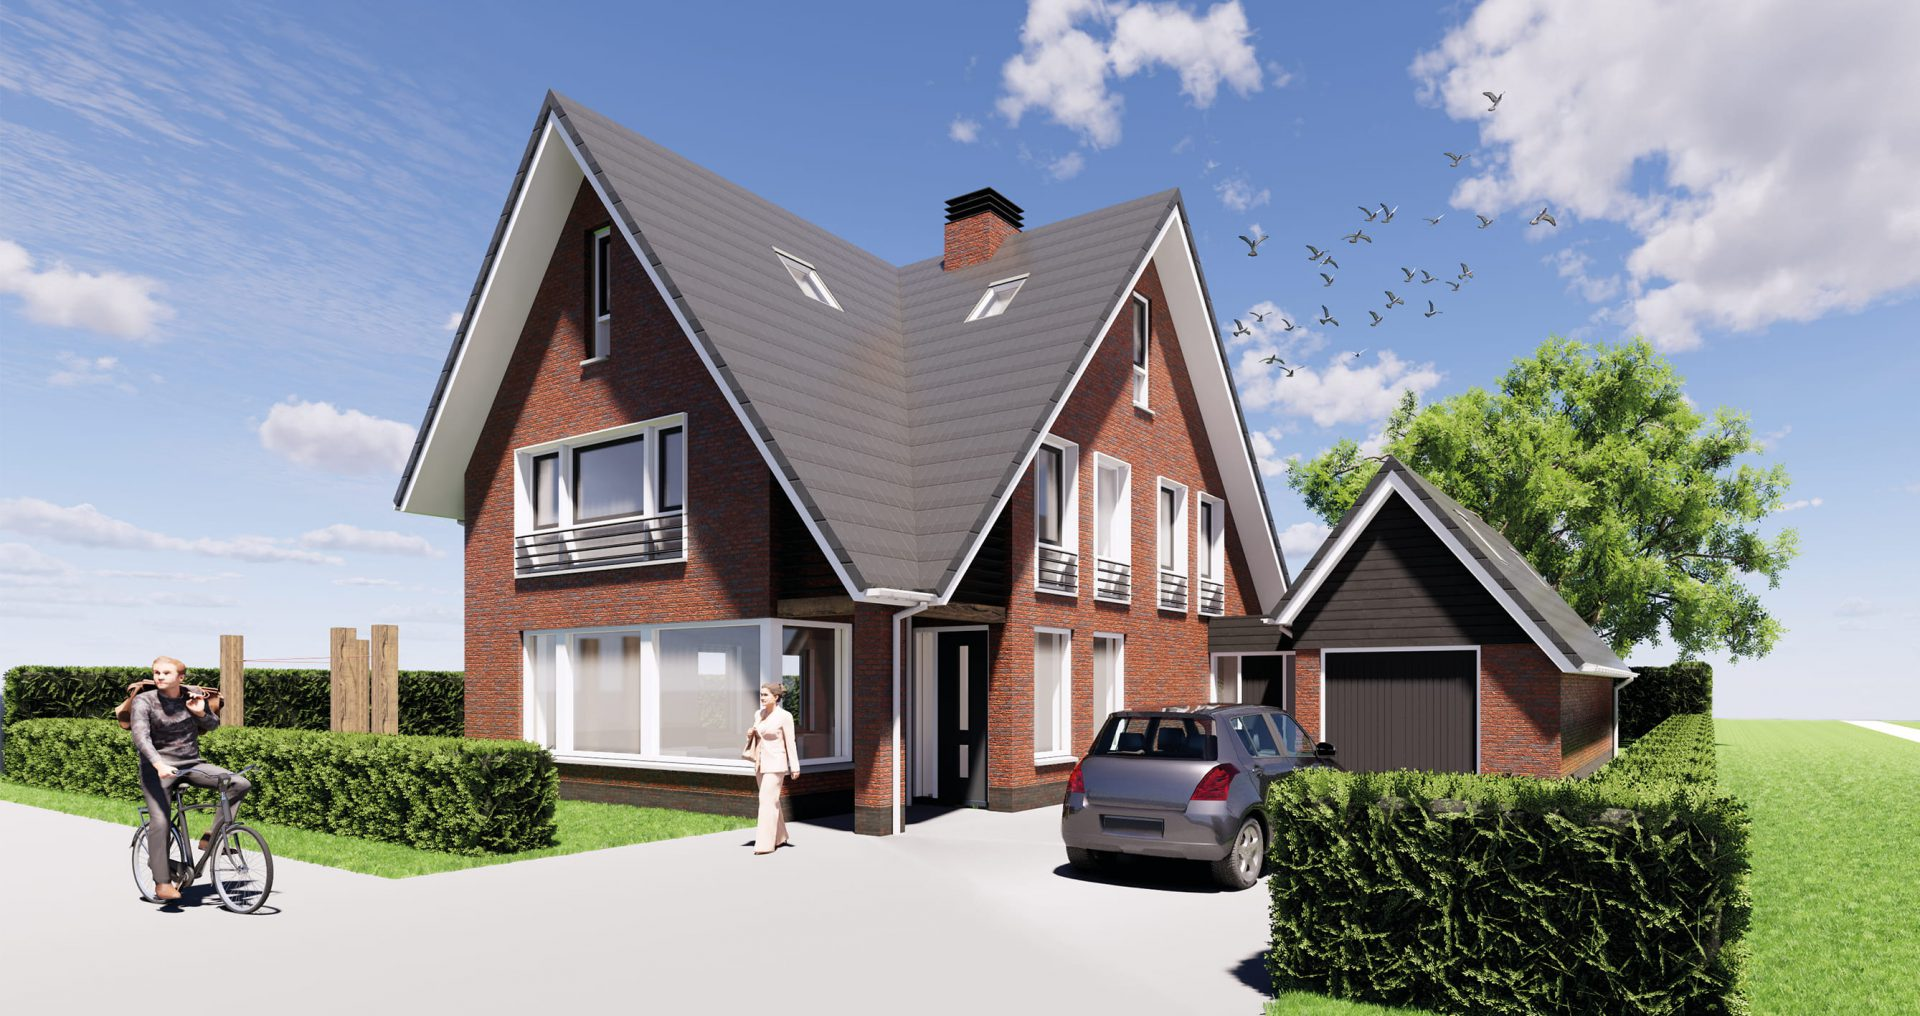 Villa woningbouw 3d tekening